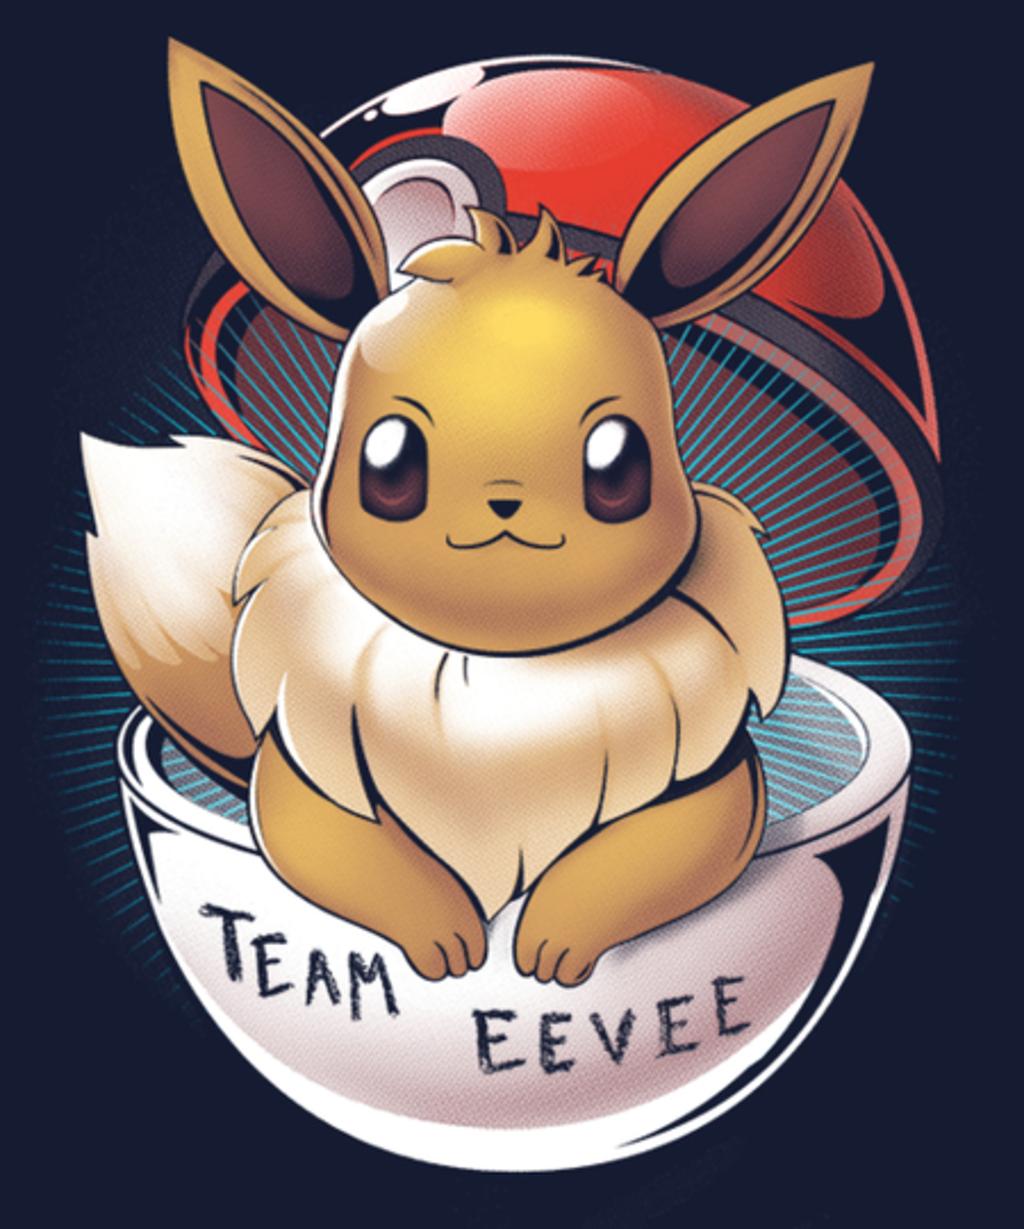 Qwertee: Team Eevee